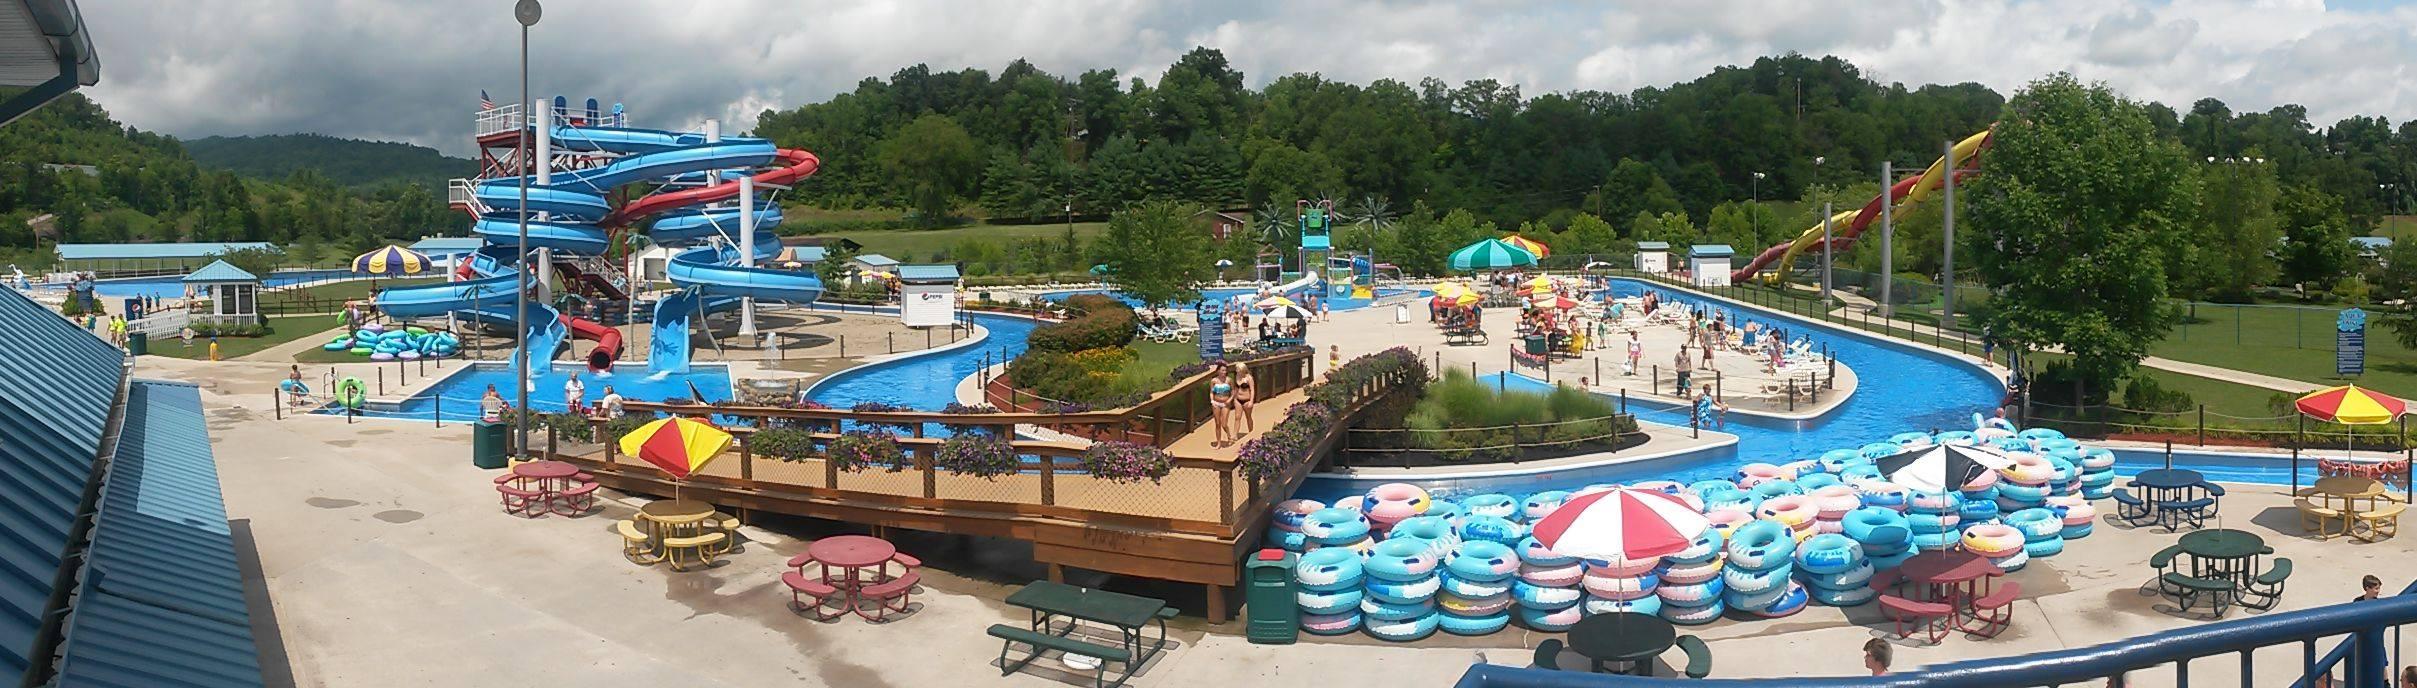 Kentucky Splash Waterpark and Campground  1050 W Highway 92, Williamsburg, Kentucky 40769